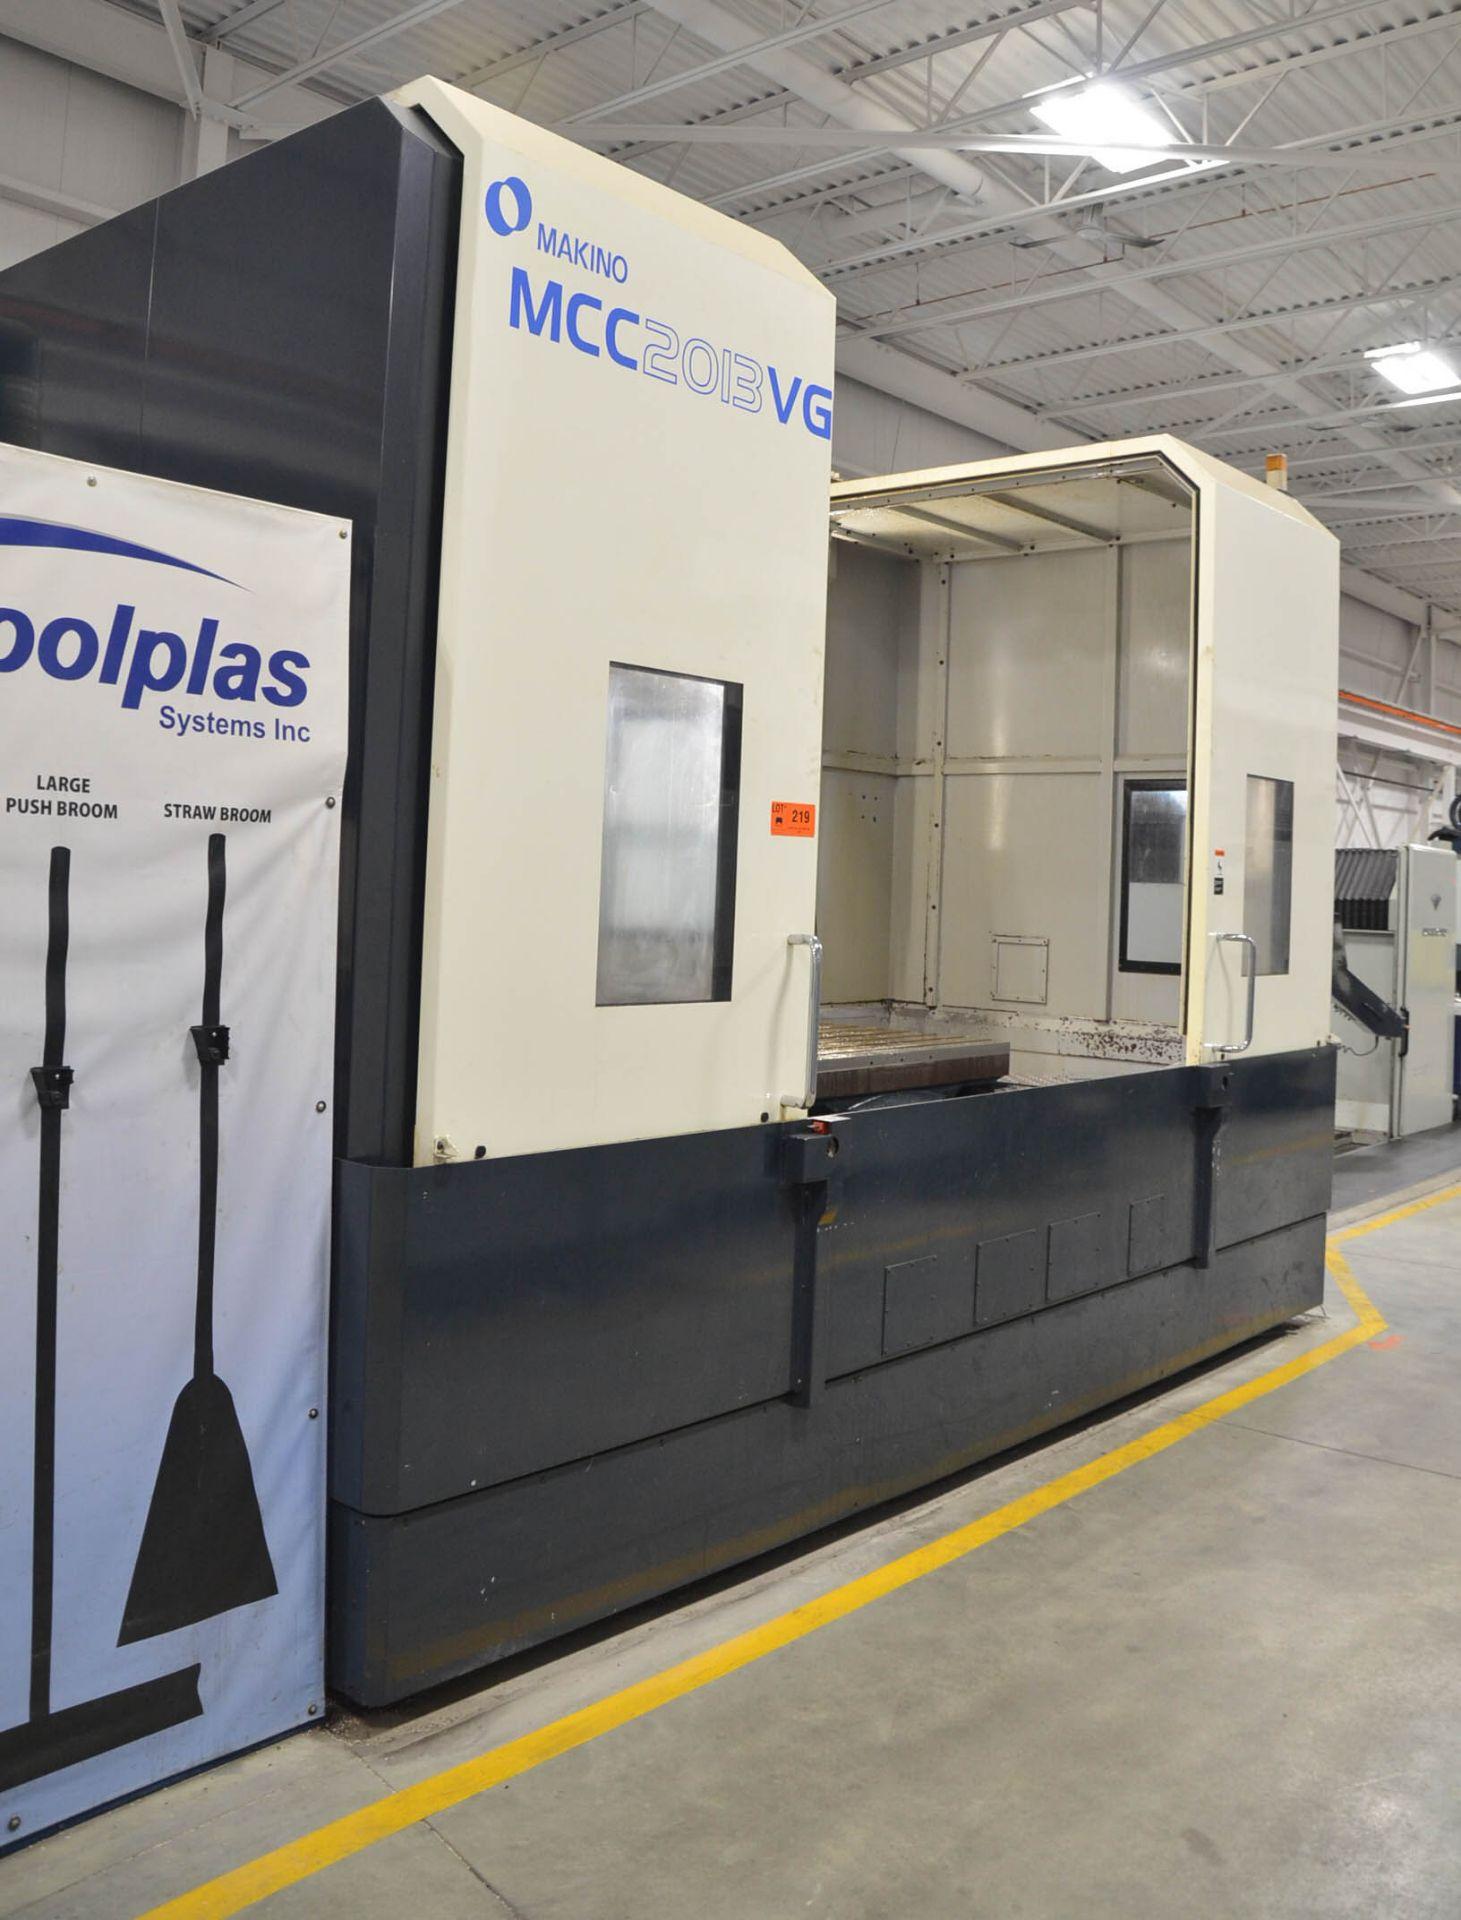 "MAKINO (2013) MCC2013 VG 6-AXIS CNC MACHINING CENTER WITH MAKINO PROFESSIONAL 5 CNC CONTROL, 59"" X - Image 4 of 11"